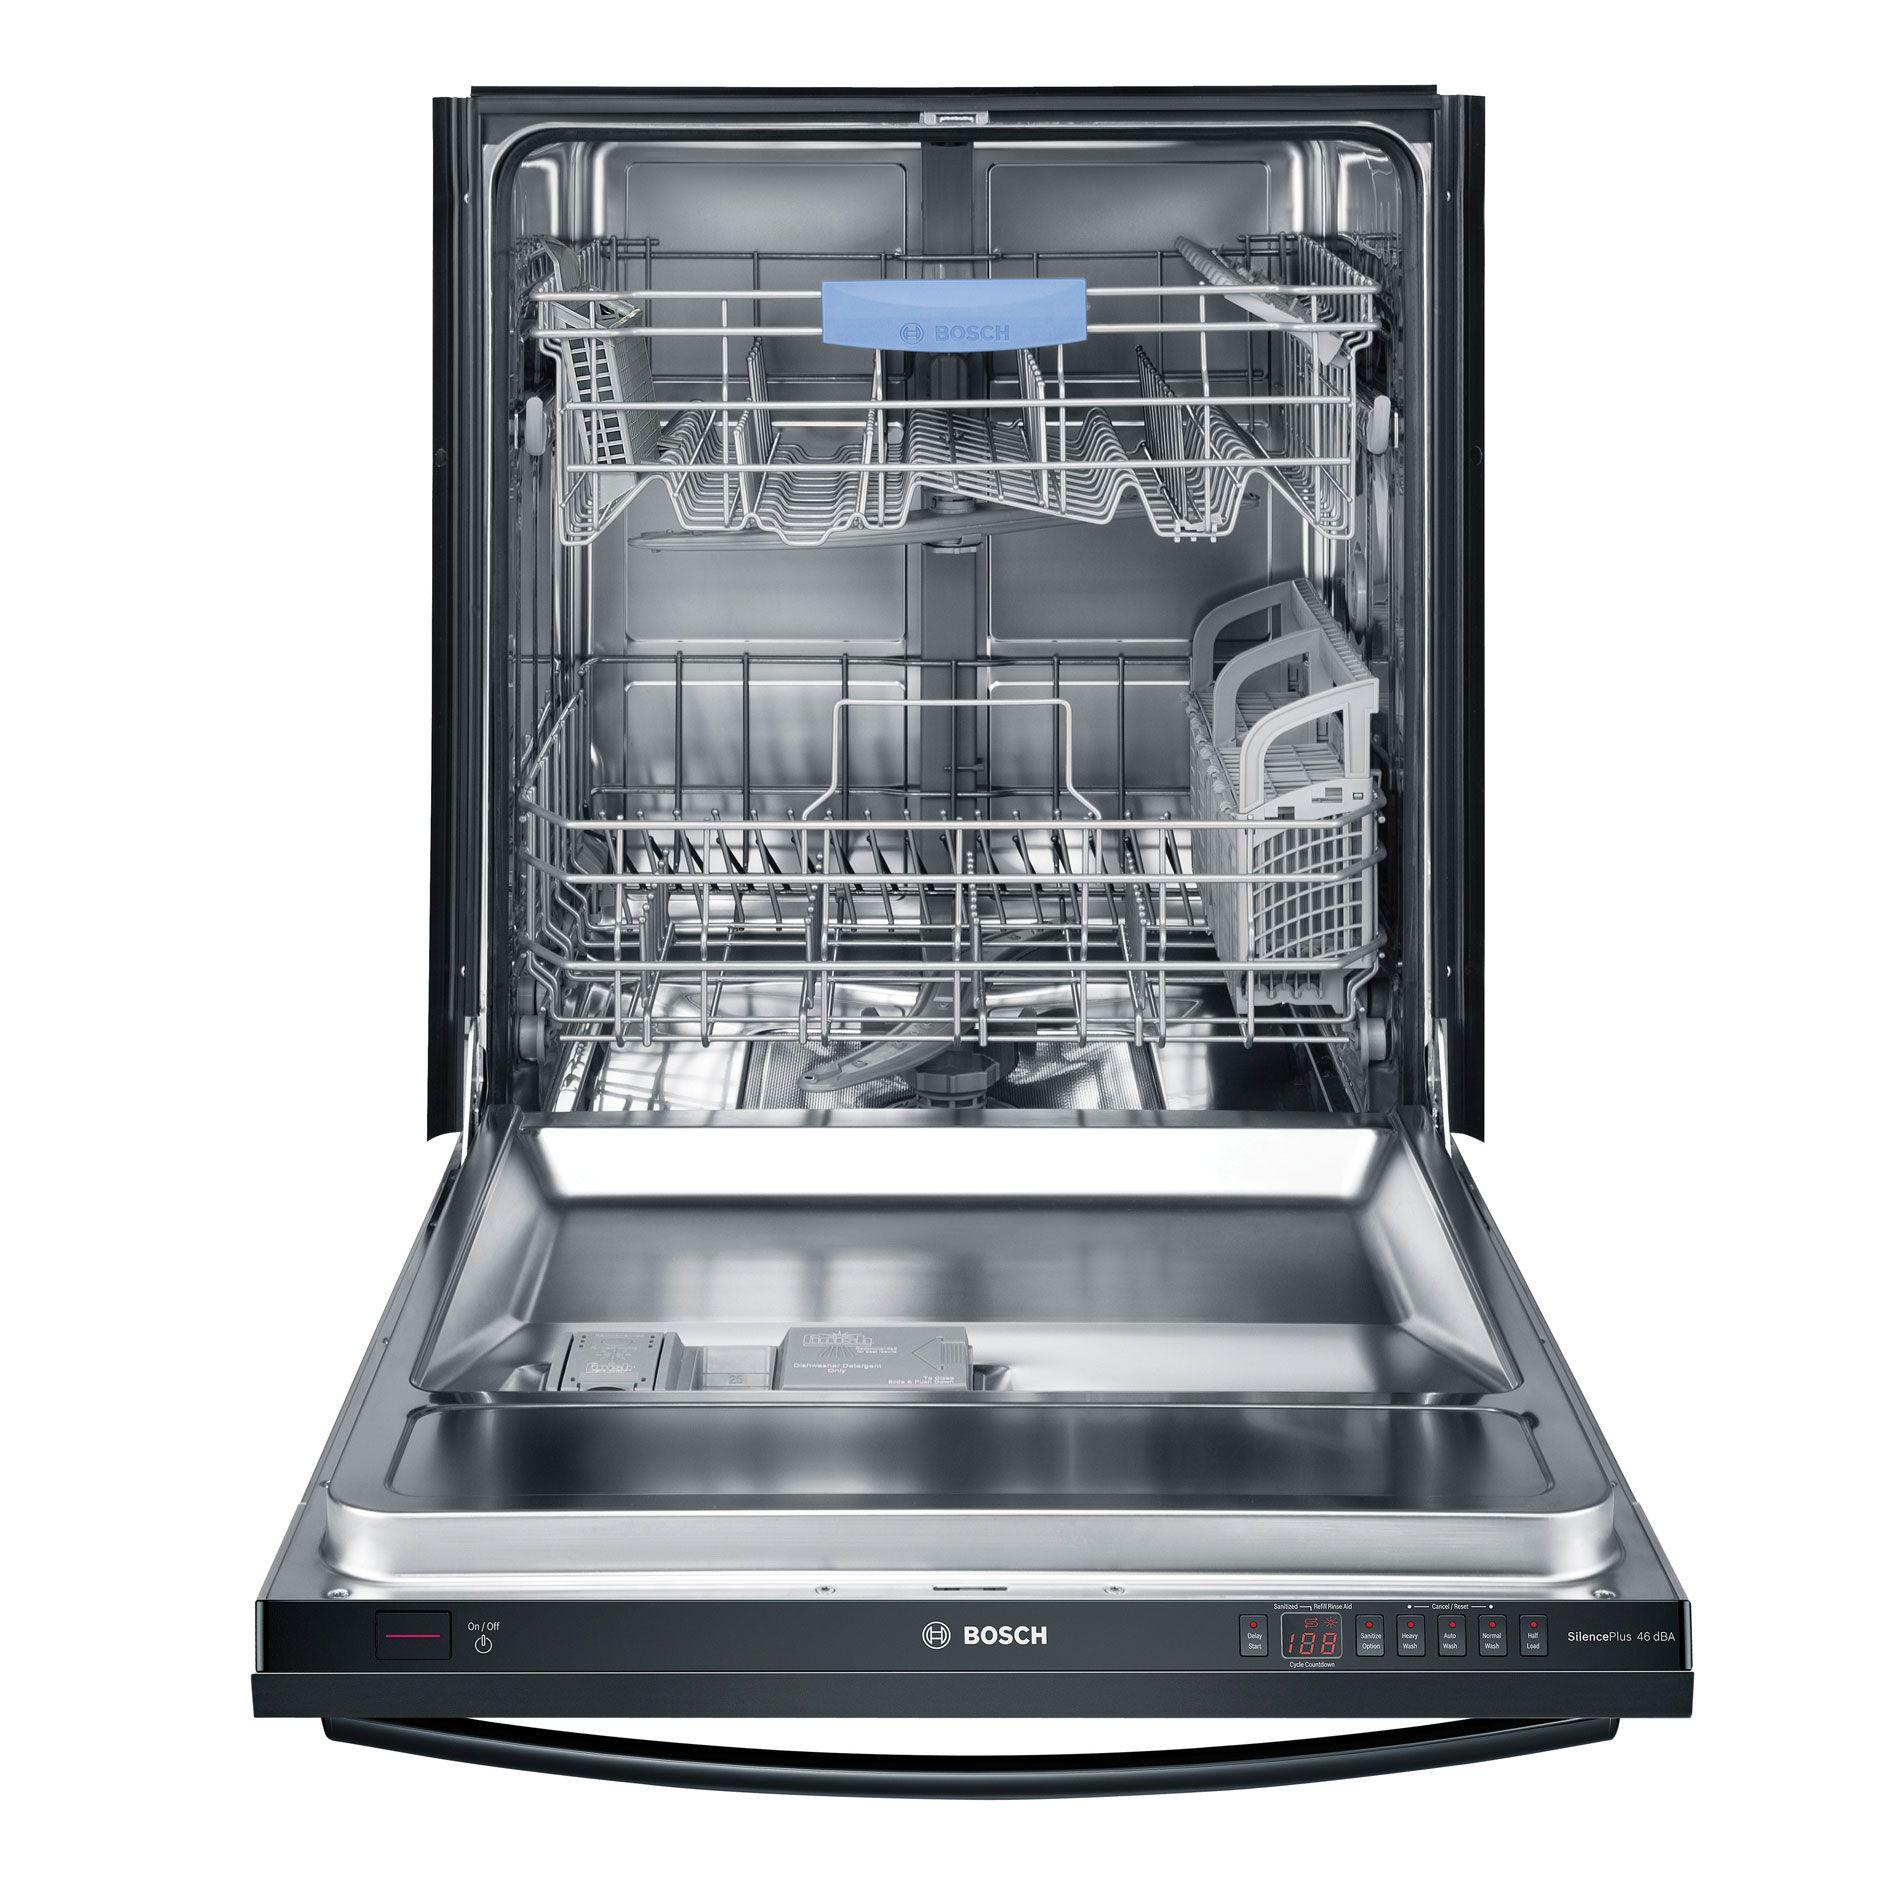 "Bosch 24"" Built-In Dishwasher Black"